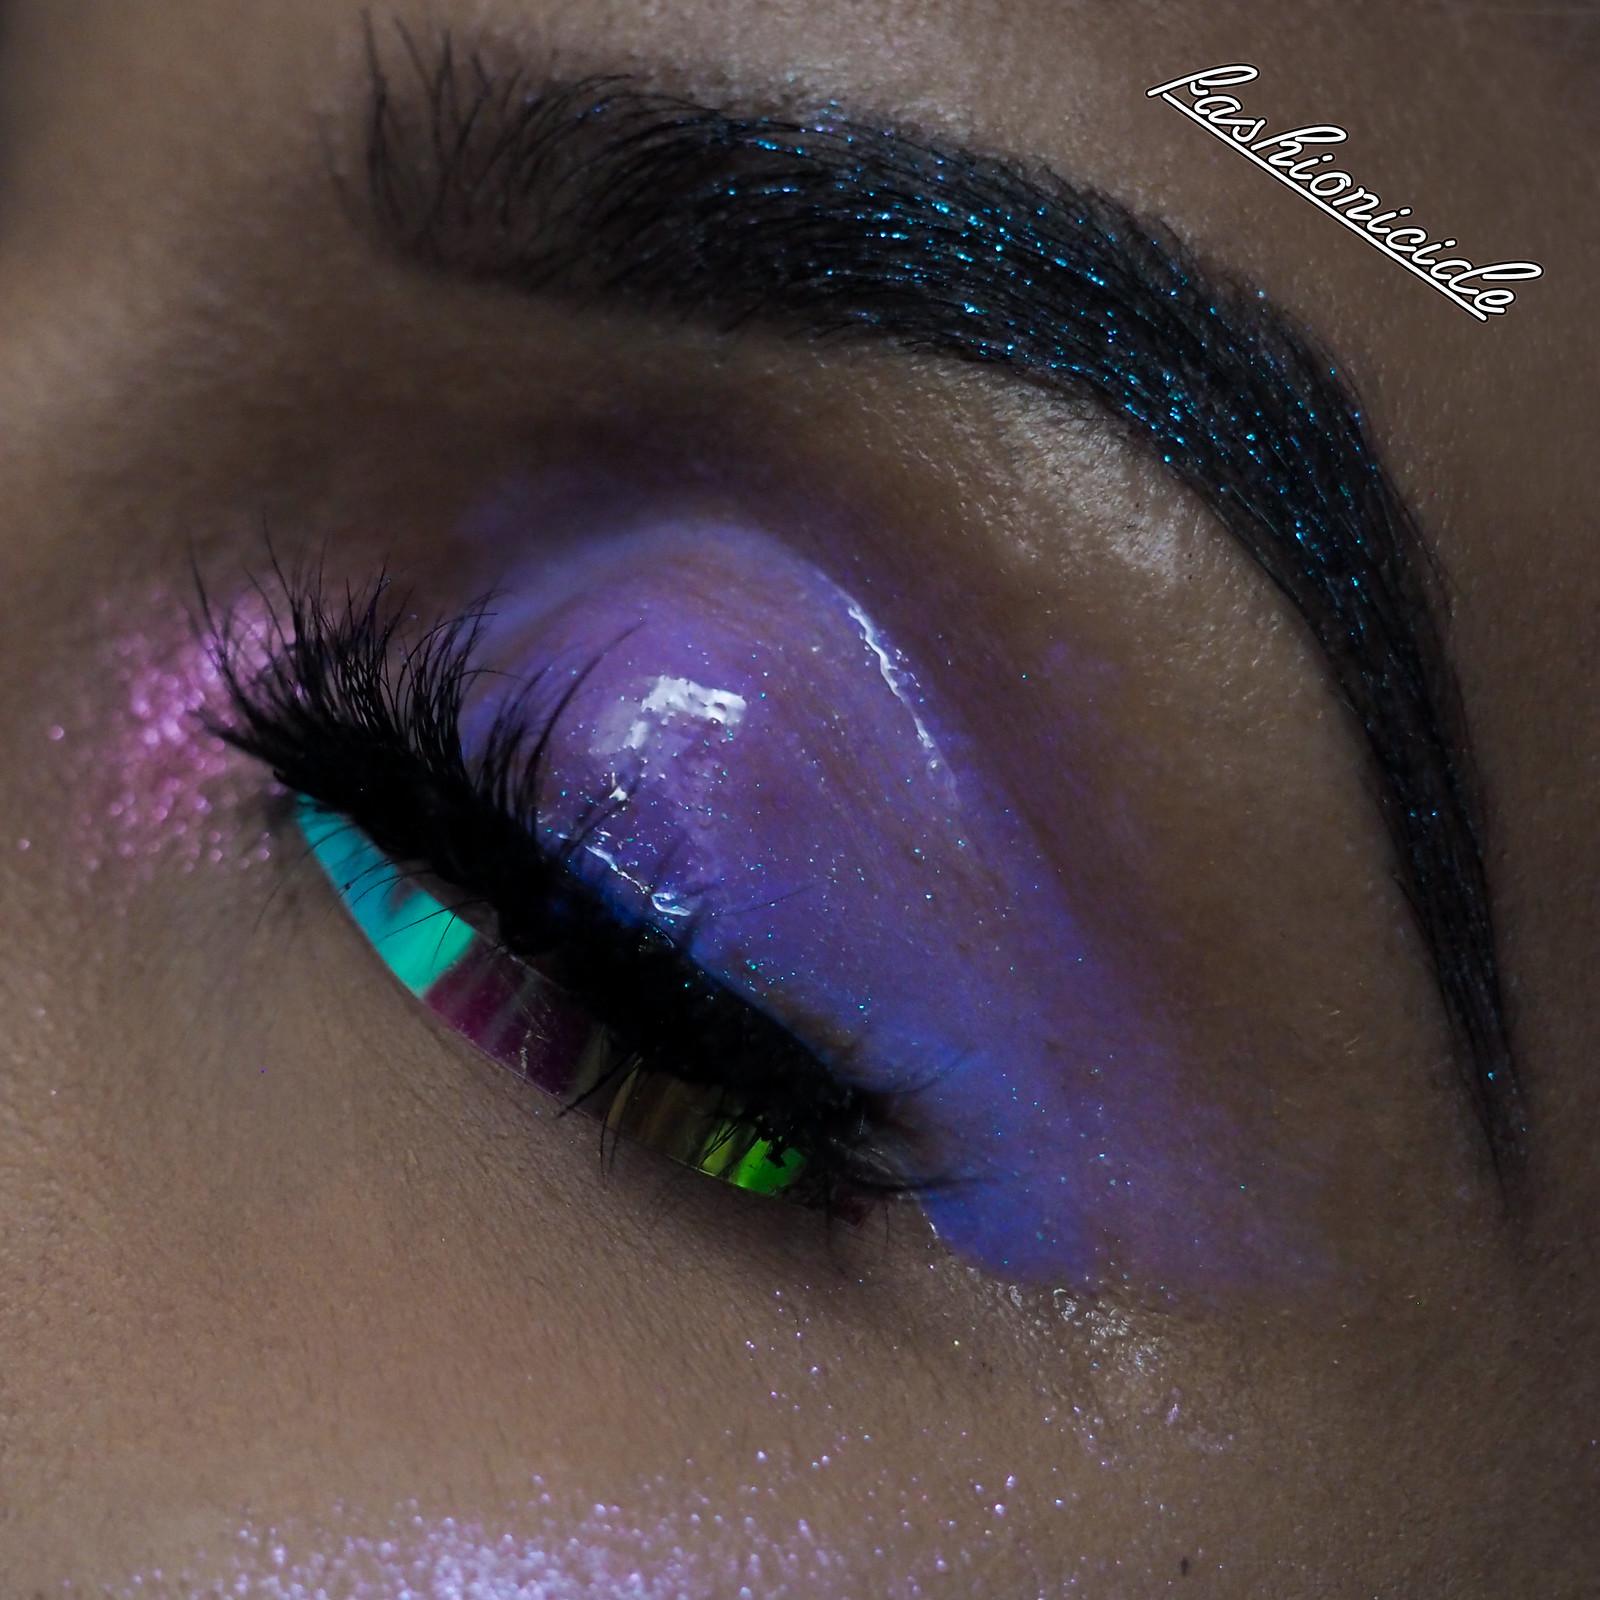 Inglot AMC Lip Gloss 541 Eye Makeup Swatch Iridescent Sigma Lip Switch Transcend Dupe Dark Skin Brown